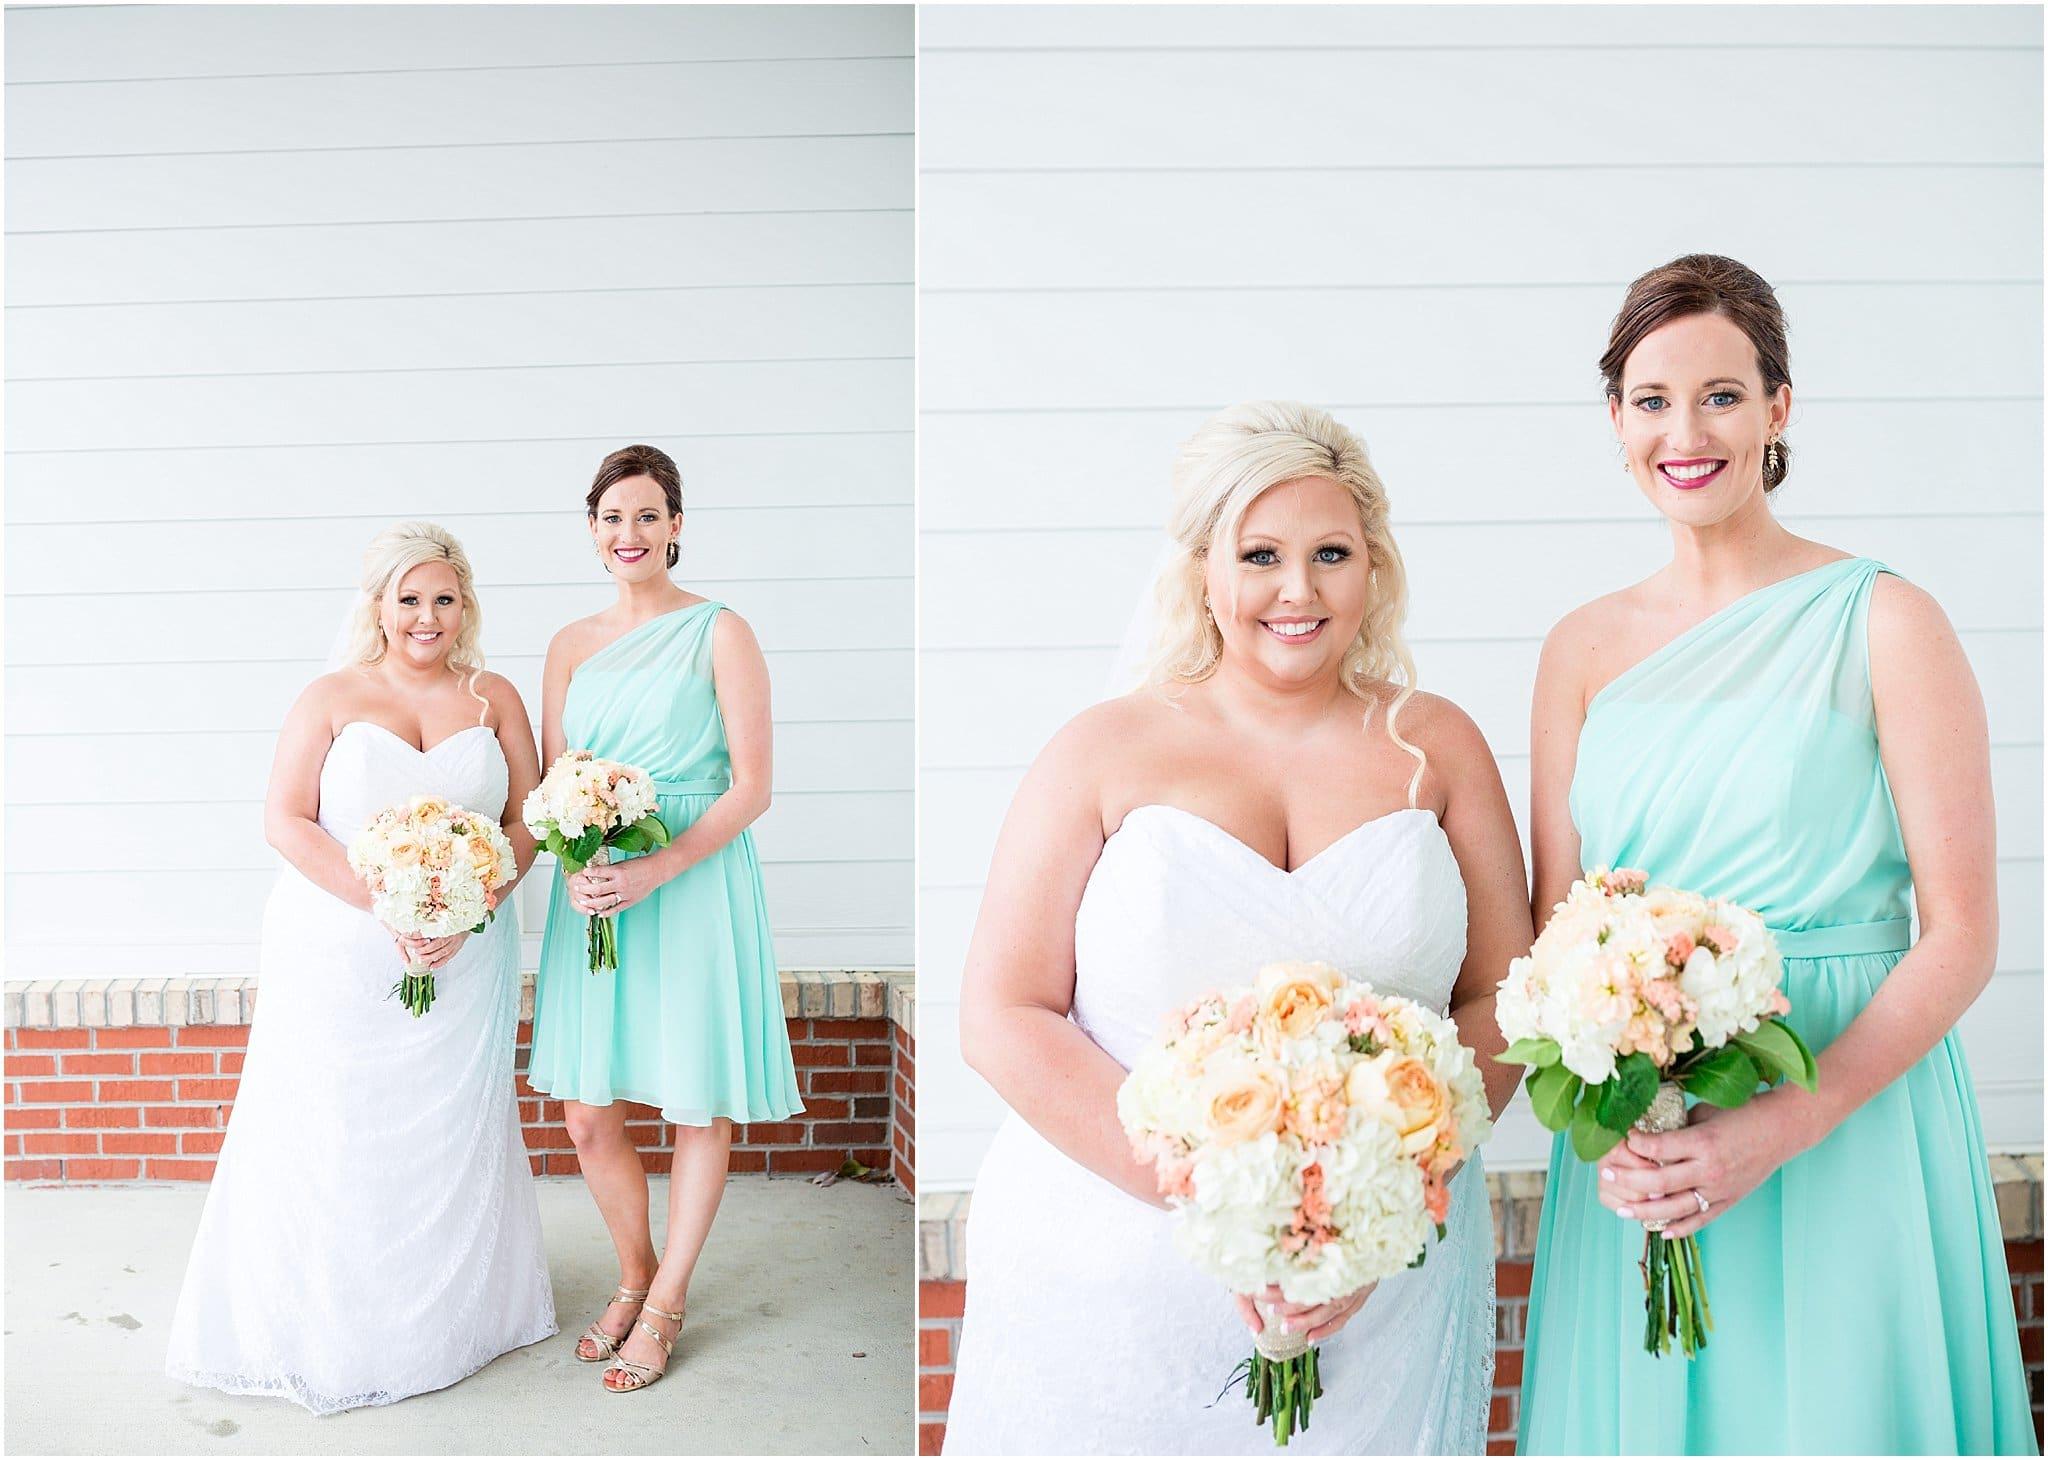 jessscott-milsboro-delaware-wedding-cassidymrphotography_0030